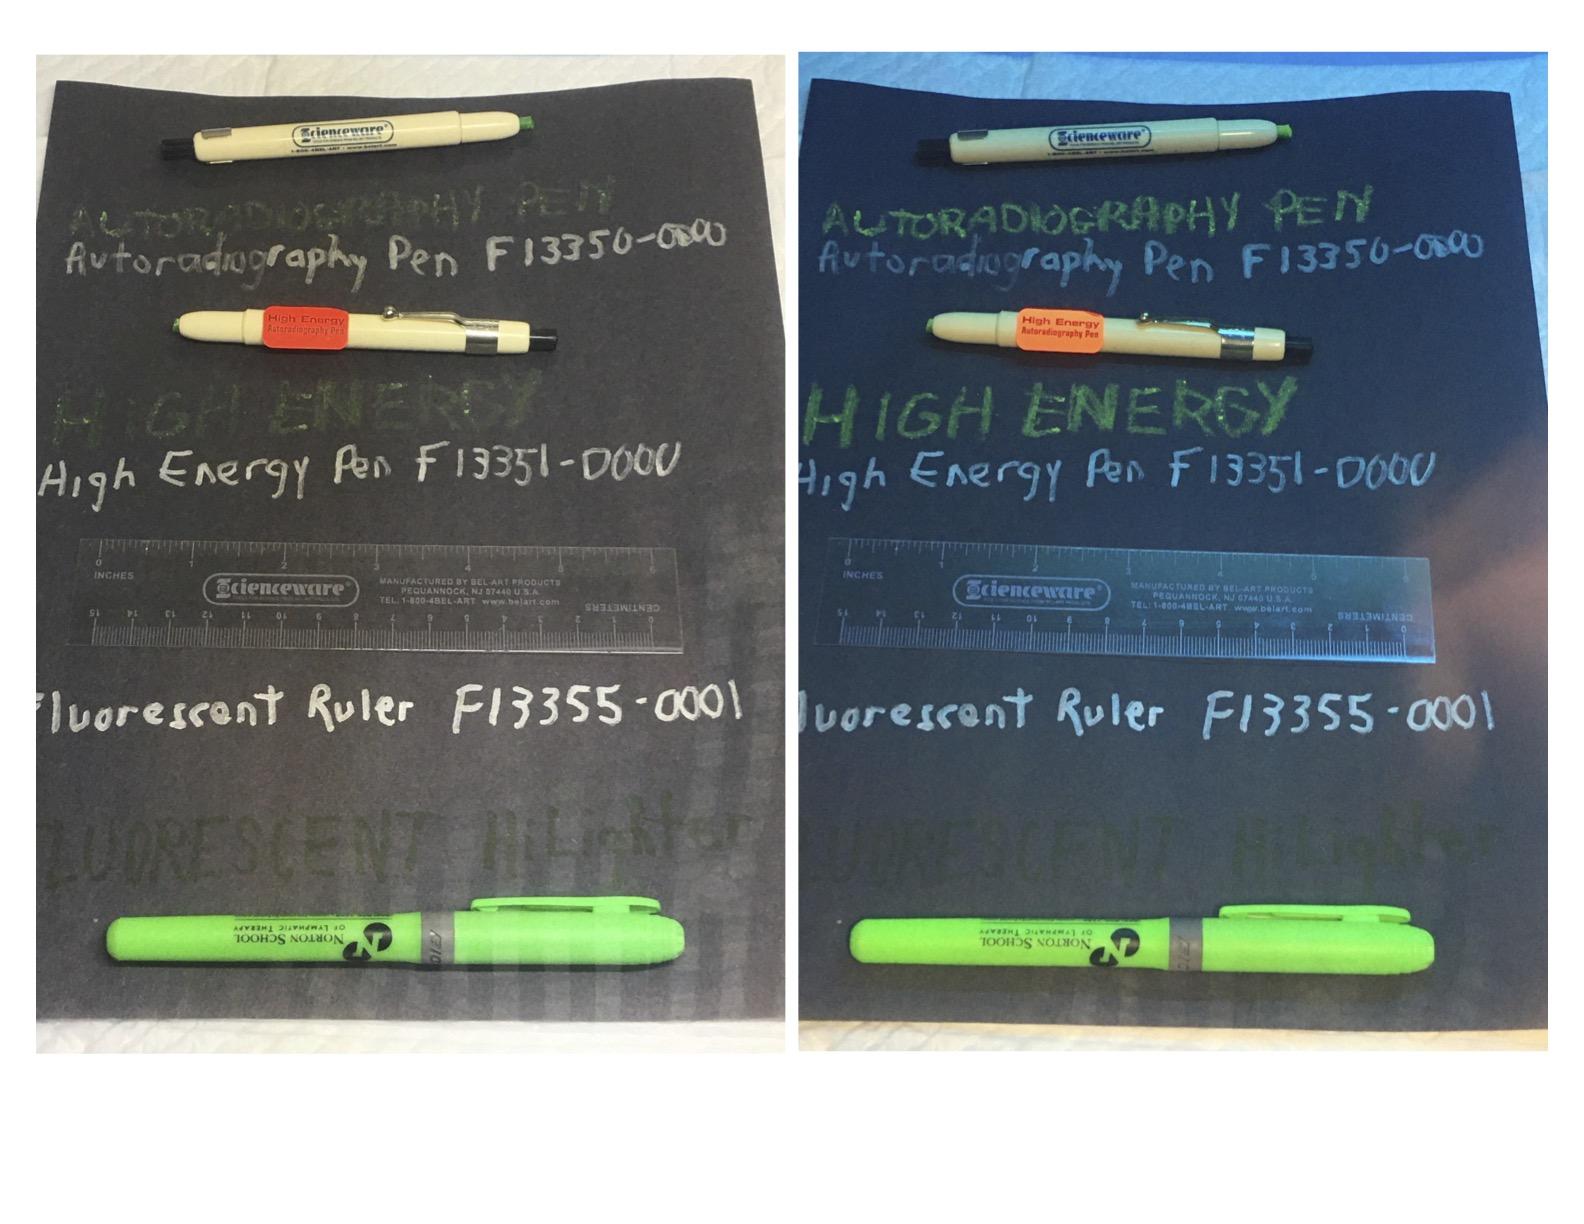 Image: autoradiography pens - regular and high energy